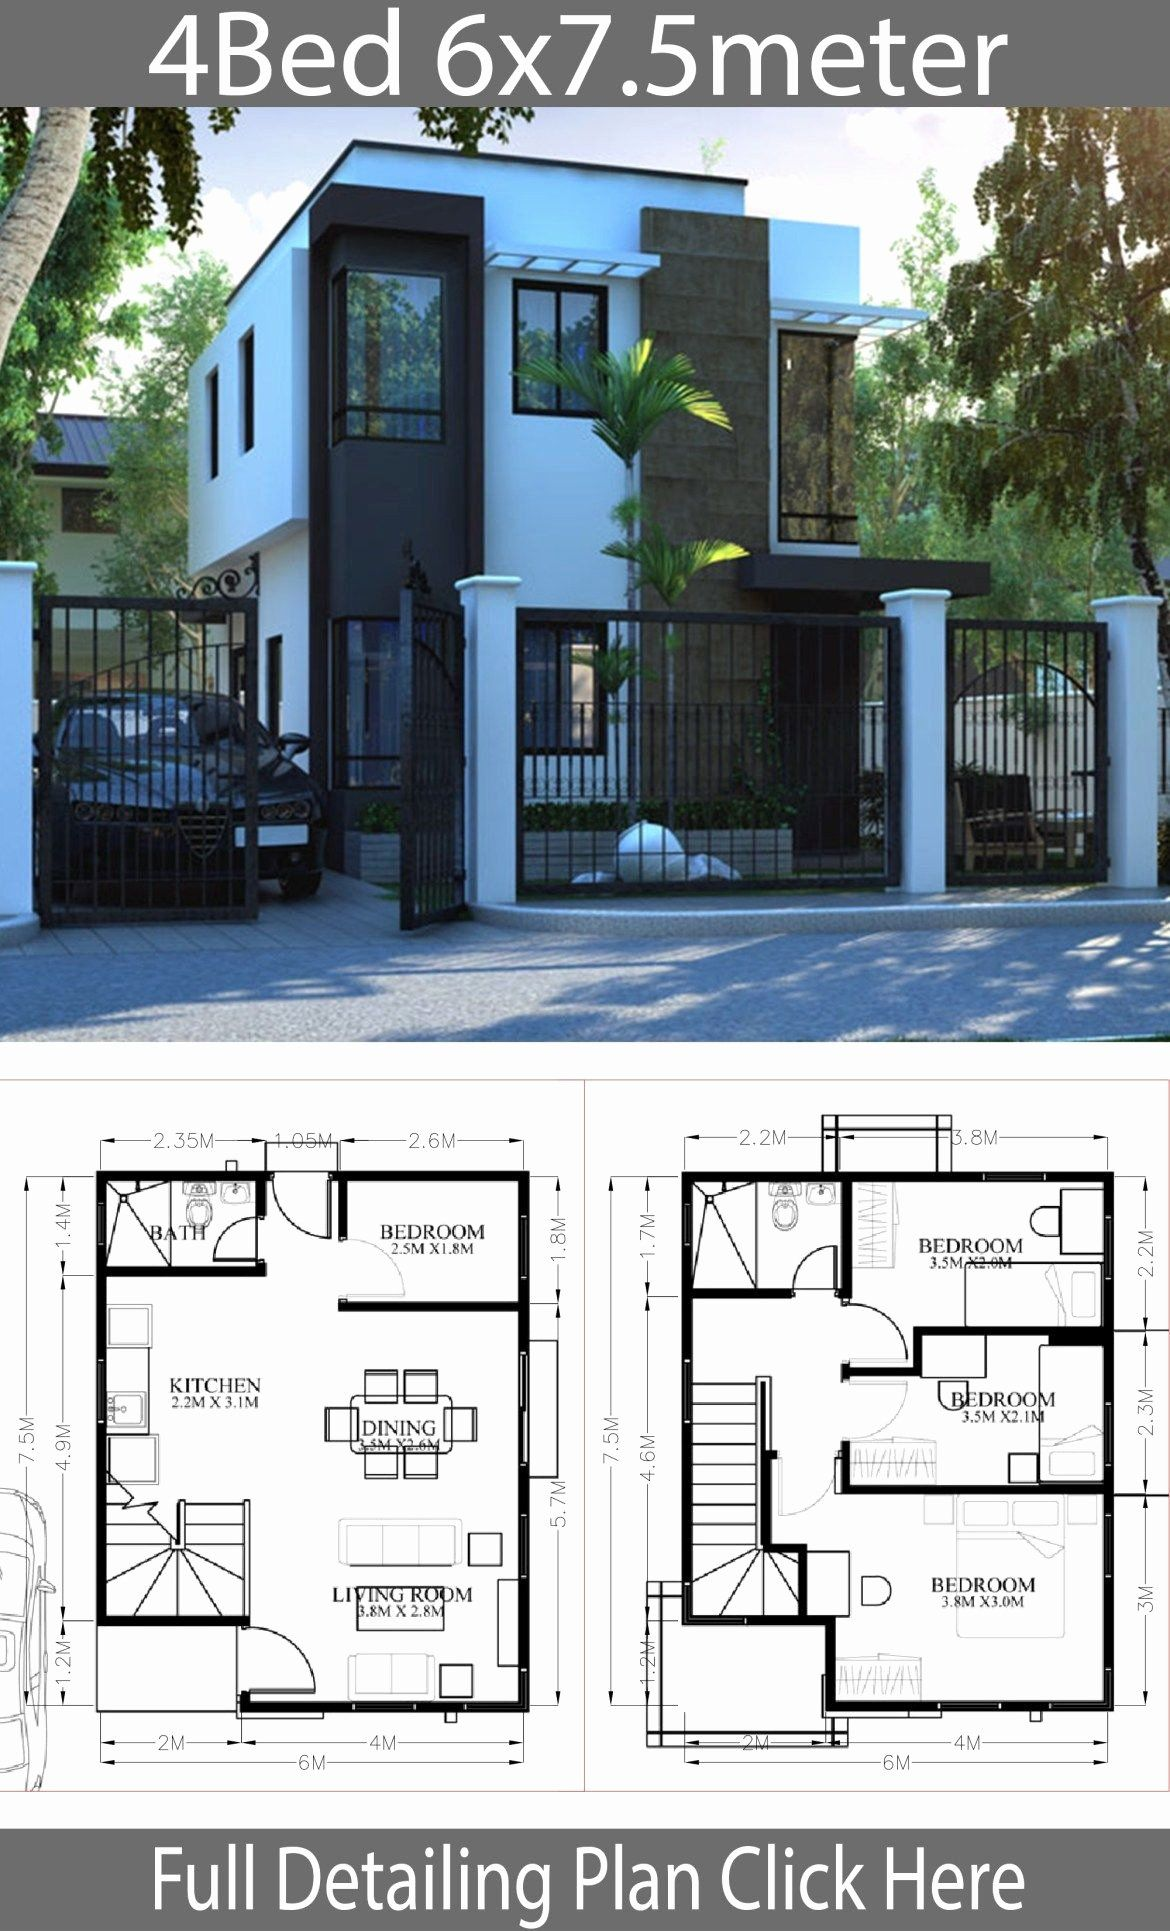 Small 4 Bedroom House Beautiful Small Home Design Plan 6x7 5m With 4 Bedrooms Arsitektur Desain Arsitektur Rumah Indah